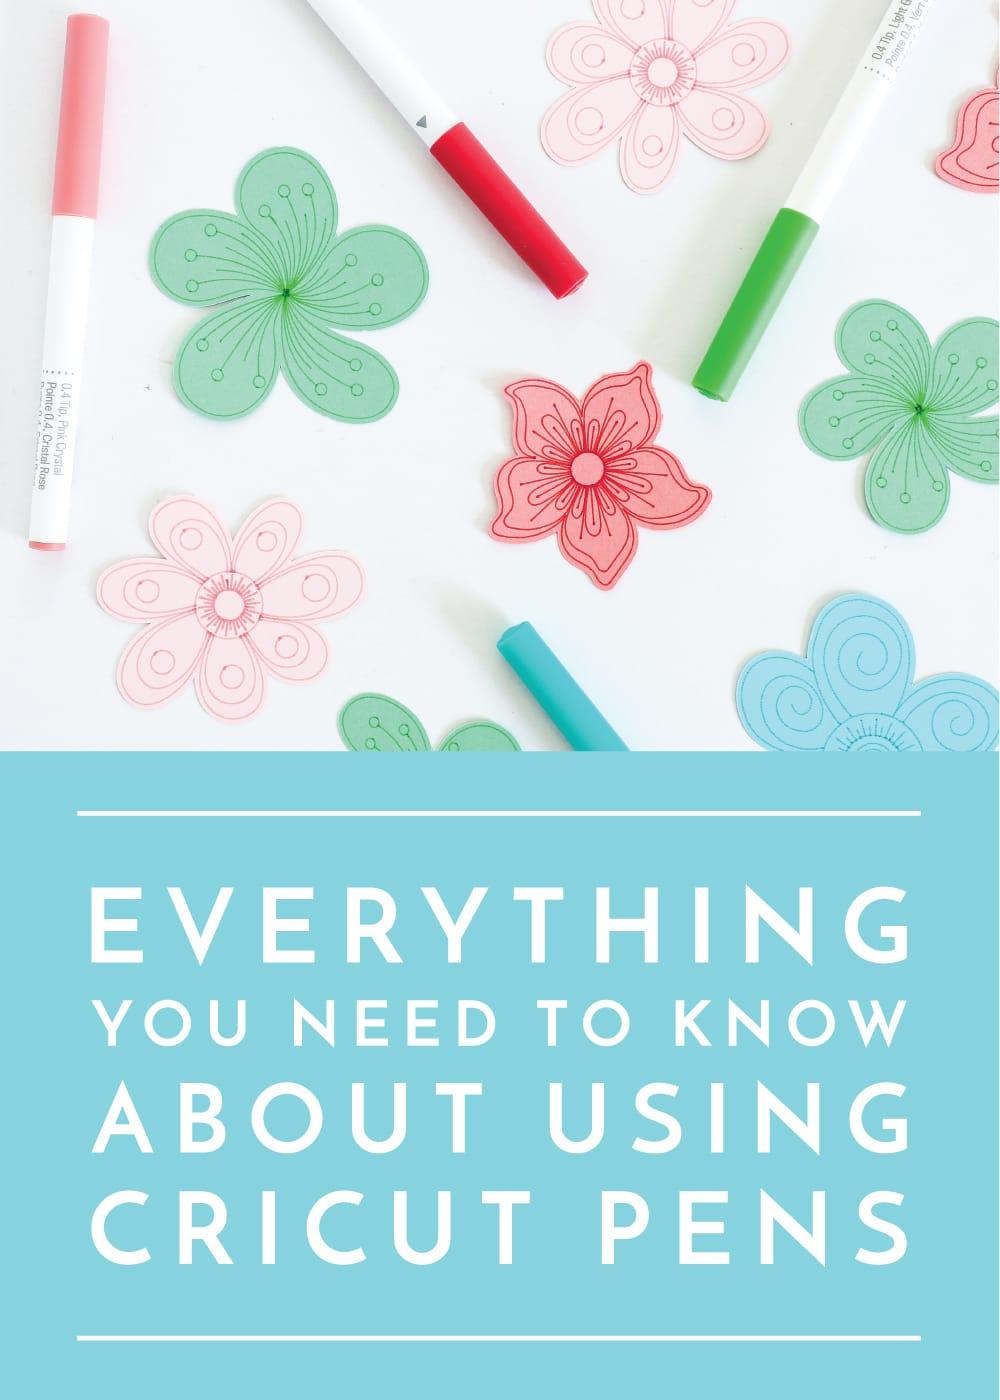 how to use Cricut pens